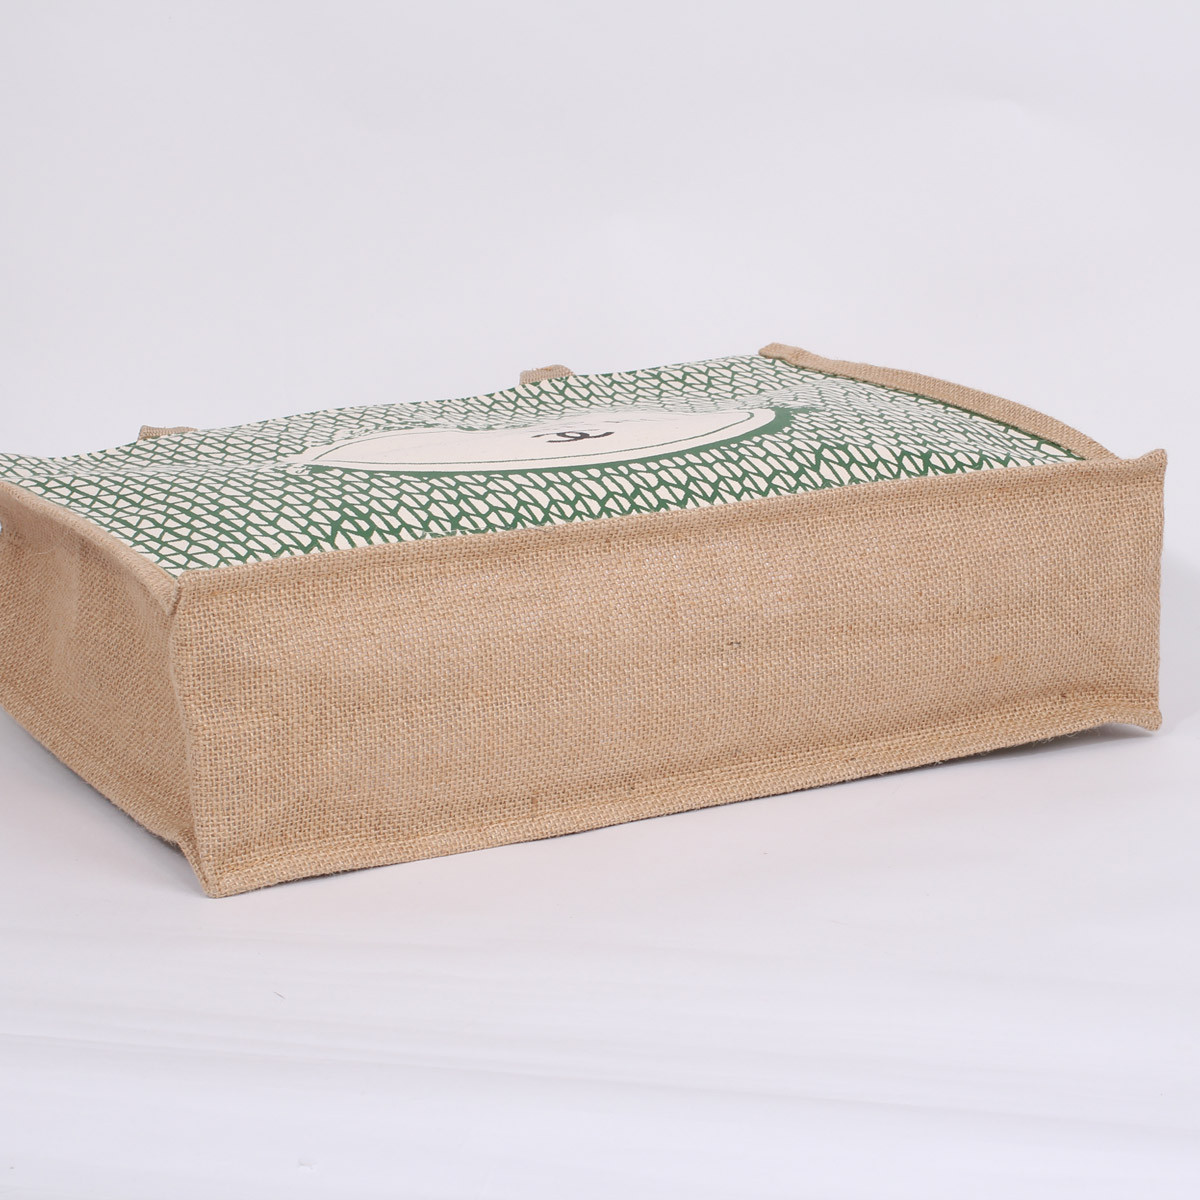 depot vente sac de luxe paris. Black Bedroom Furniture Sets. Home Design Ideas